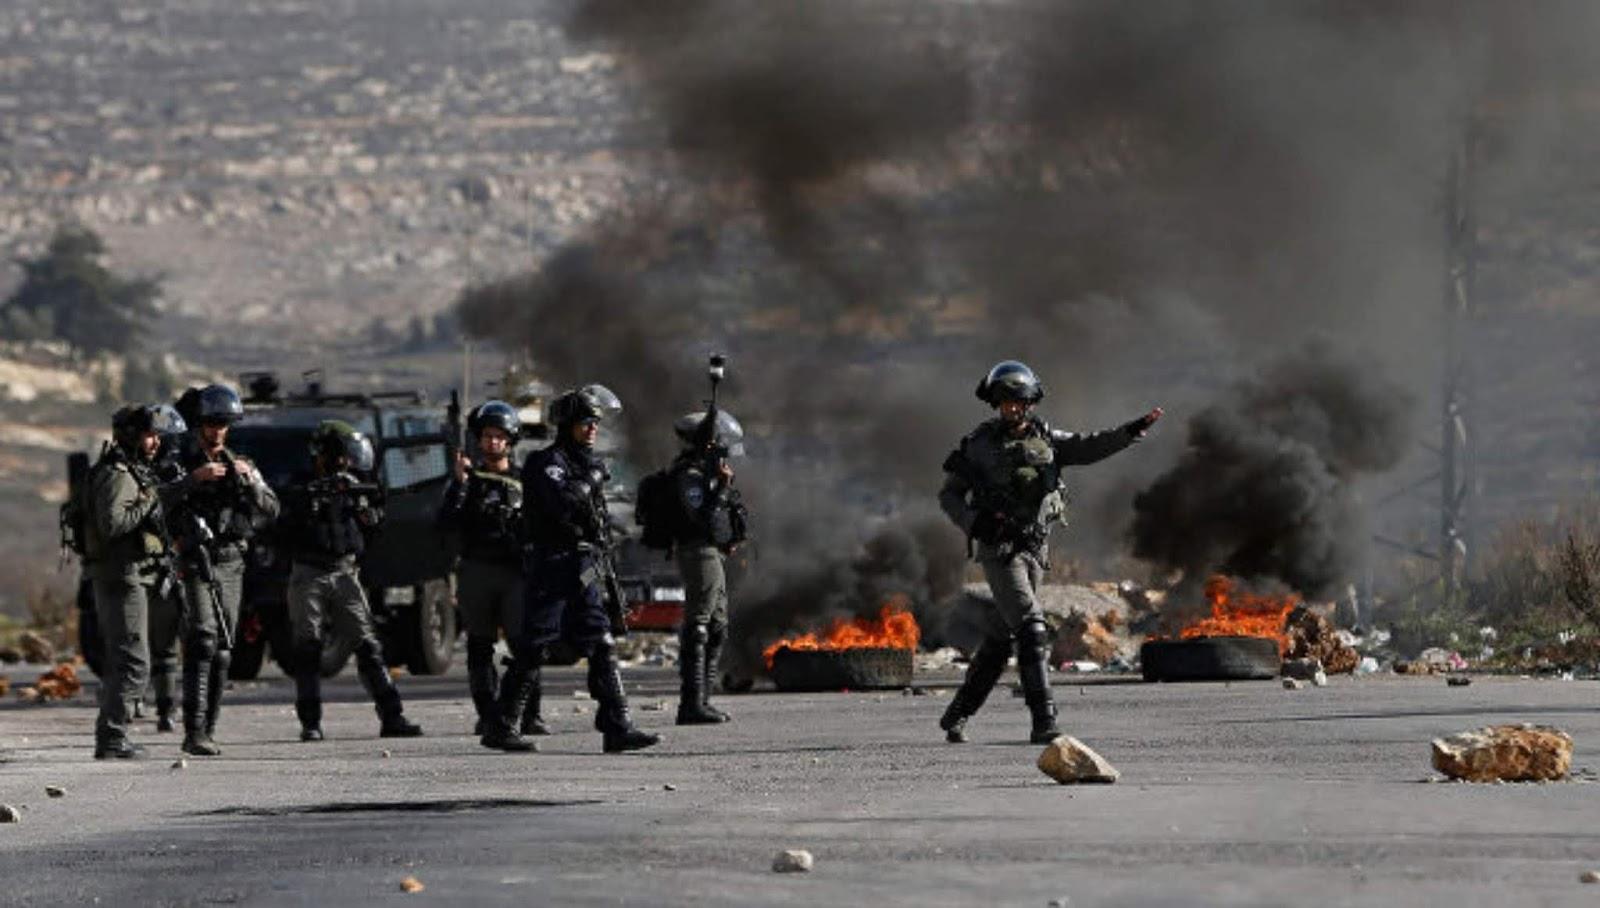 Hamas berhasil menangkap mata-mata Israel di Gaza